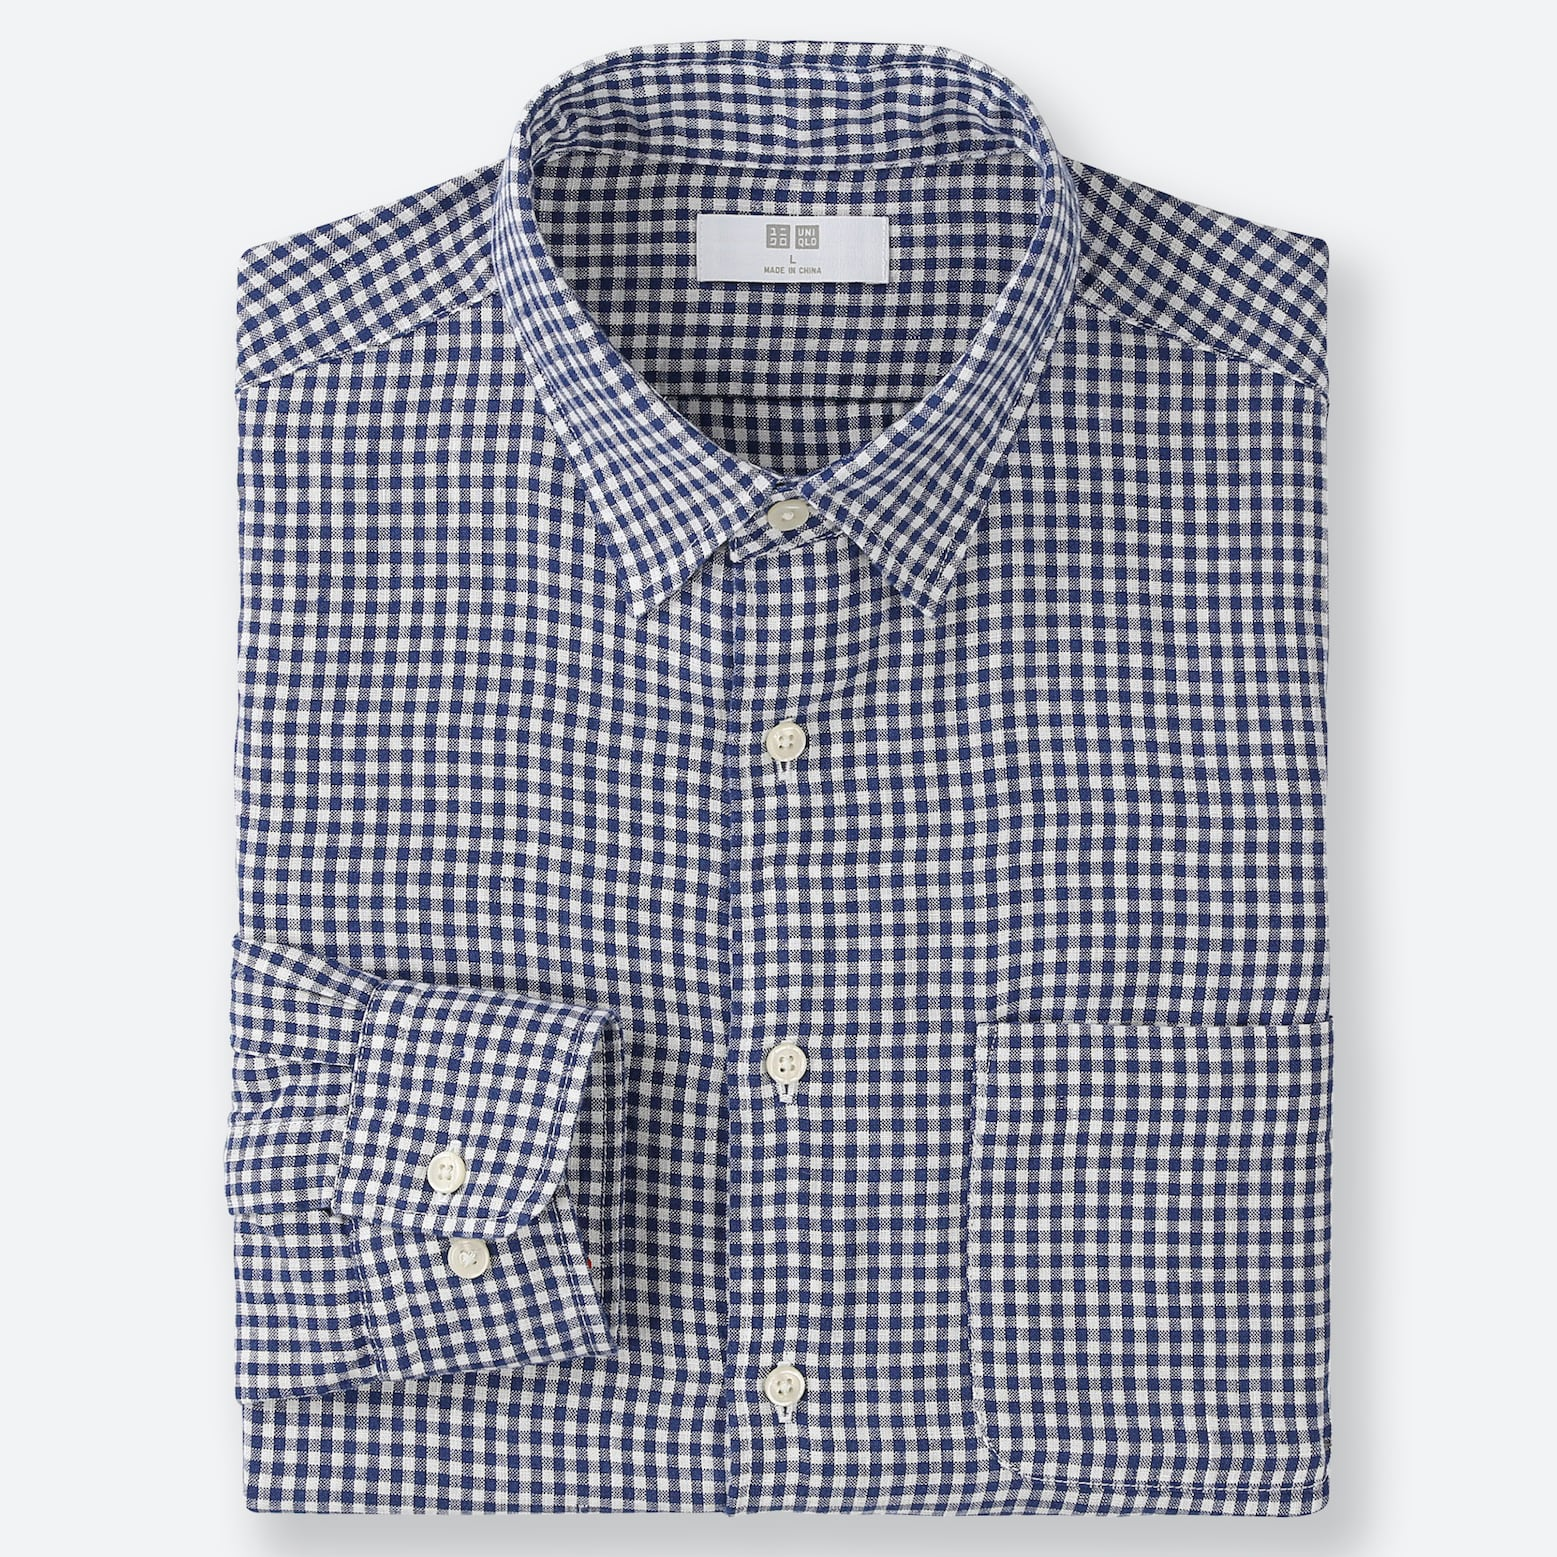 Uniqlo Ocean Wave T Shirt Soft